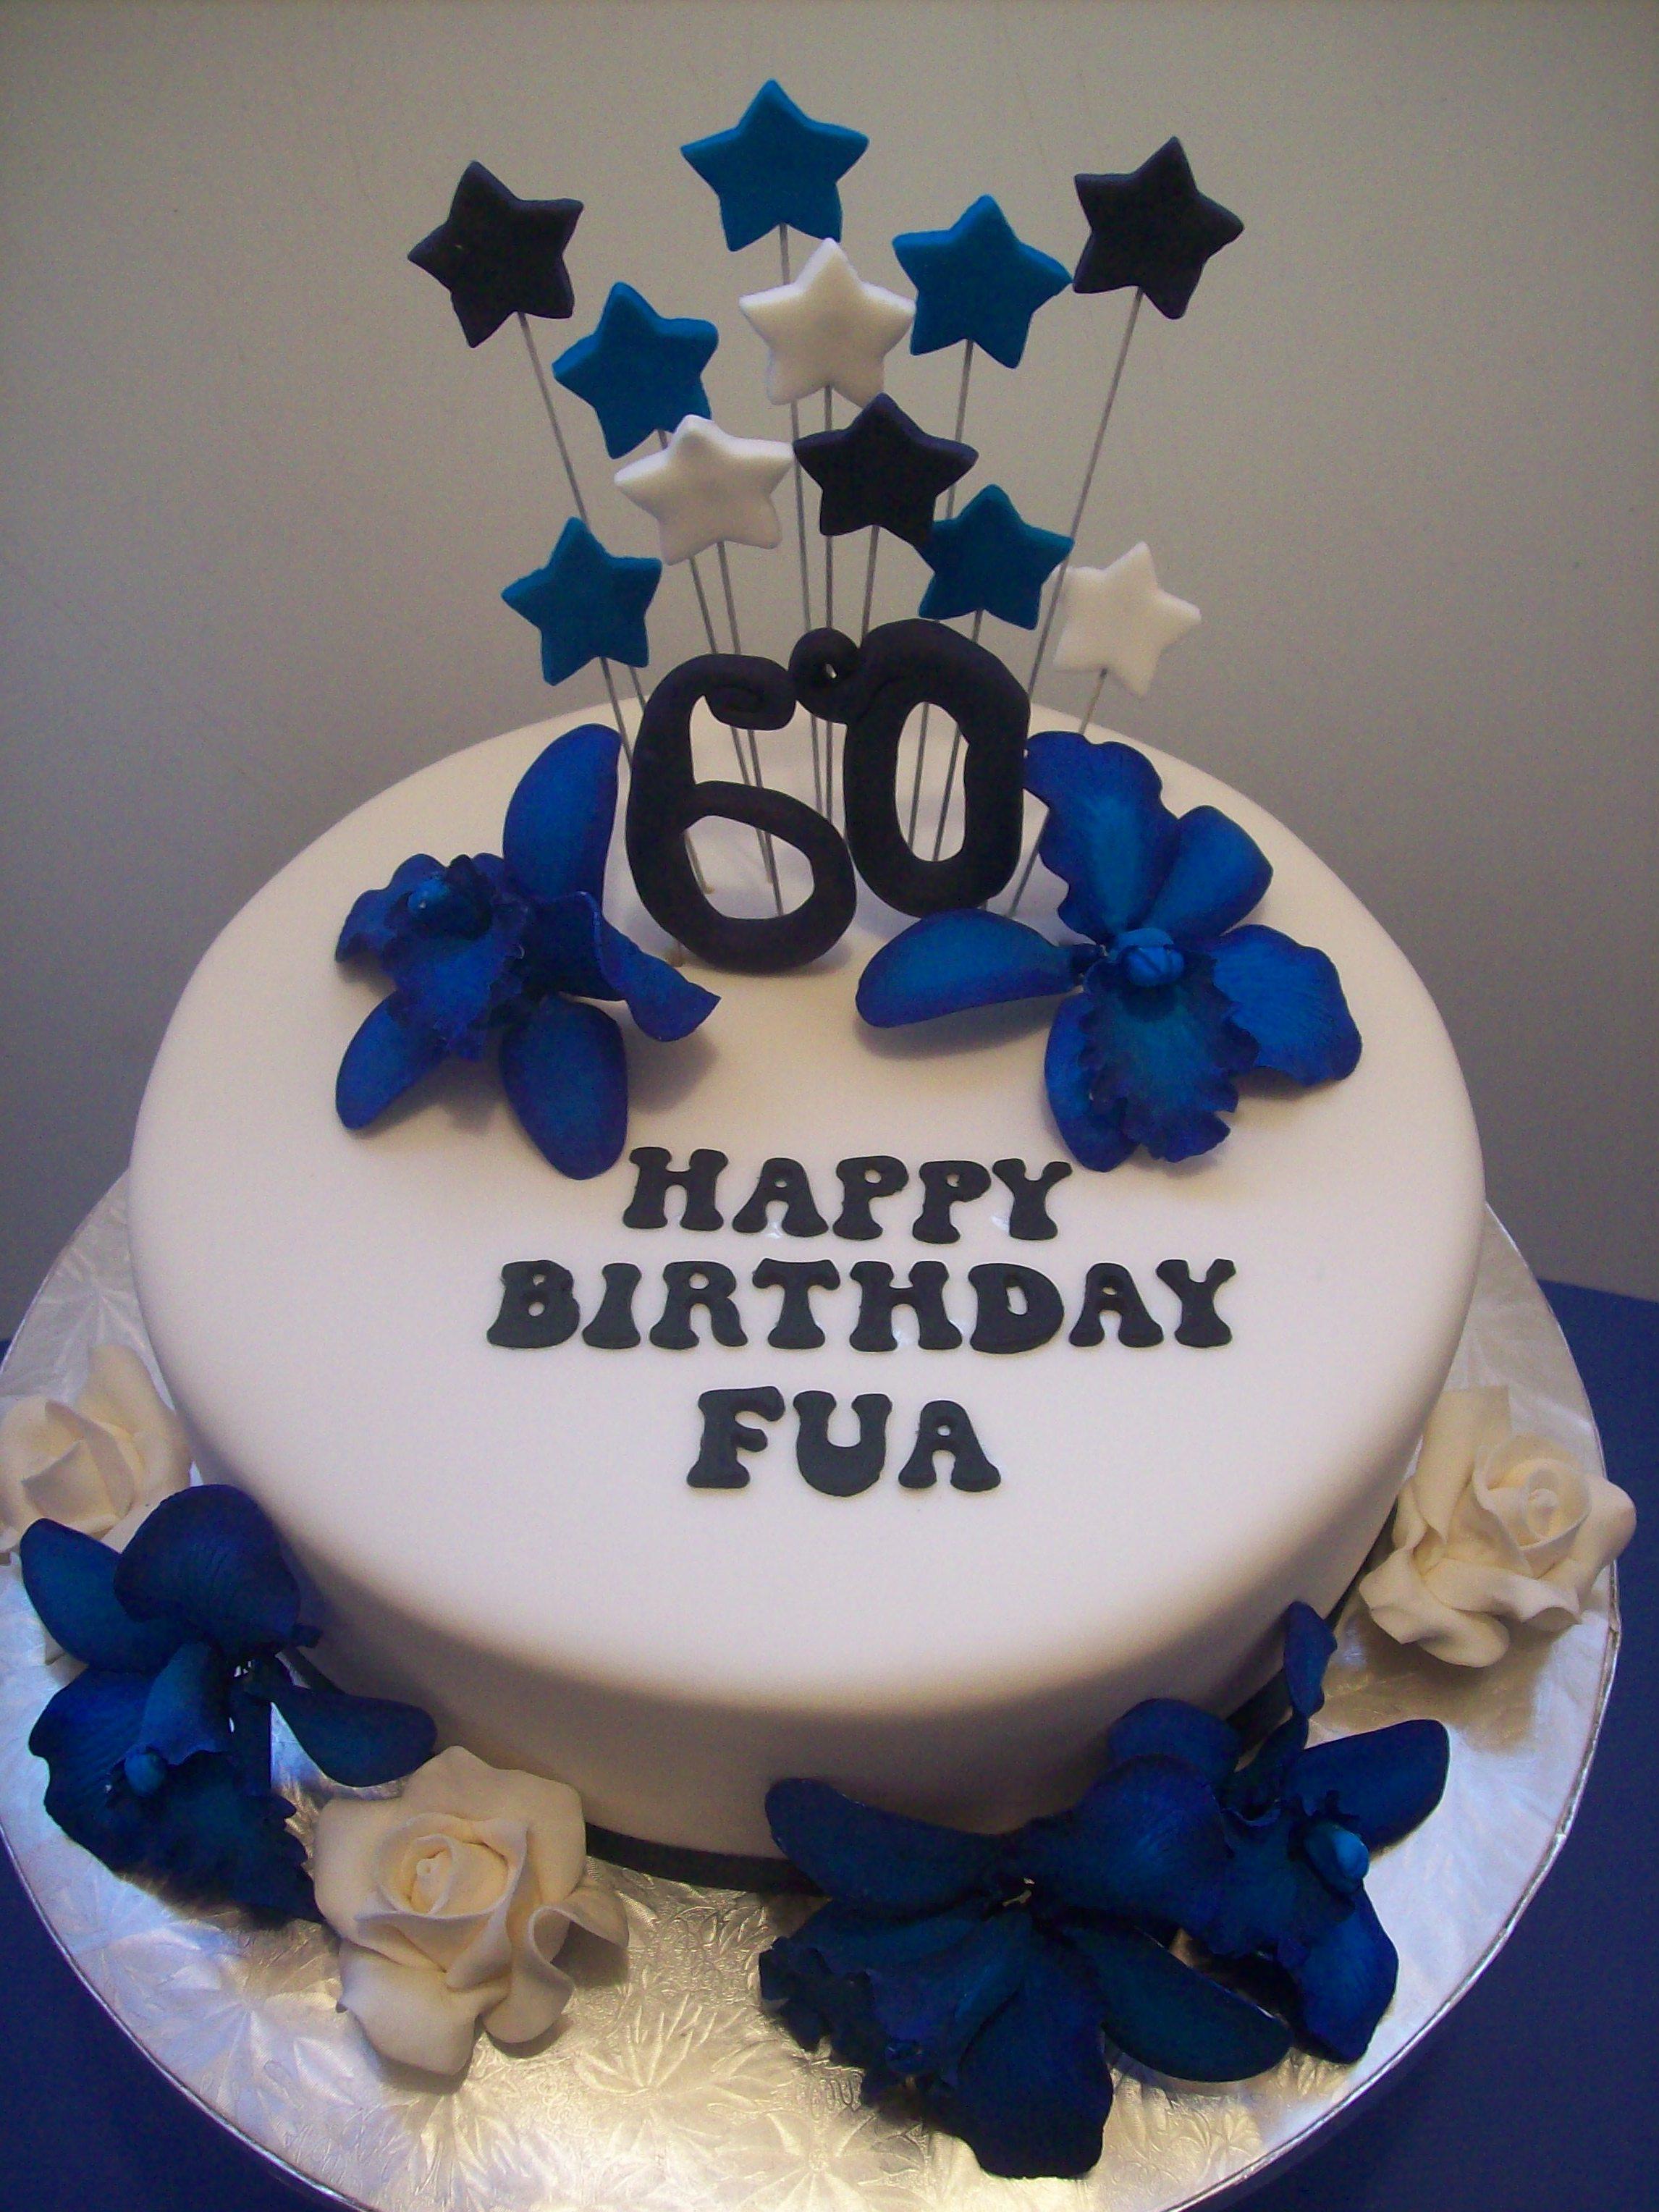 60th Birthday Cake 295 Temptation Cakes Temptation Cakes